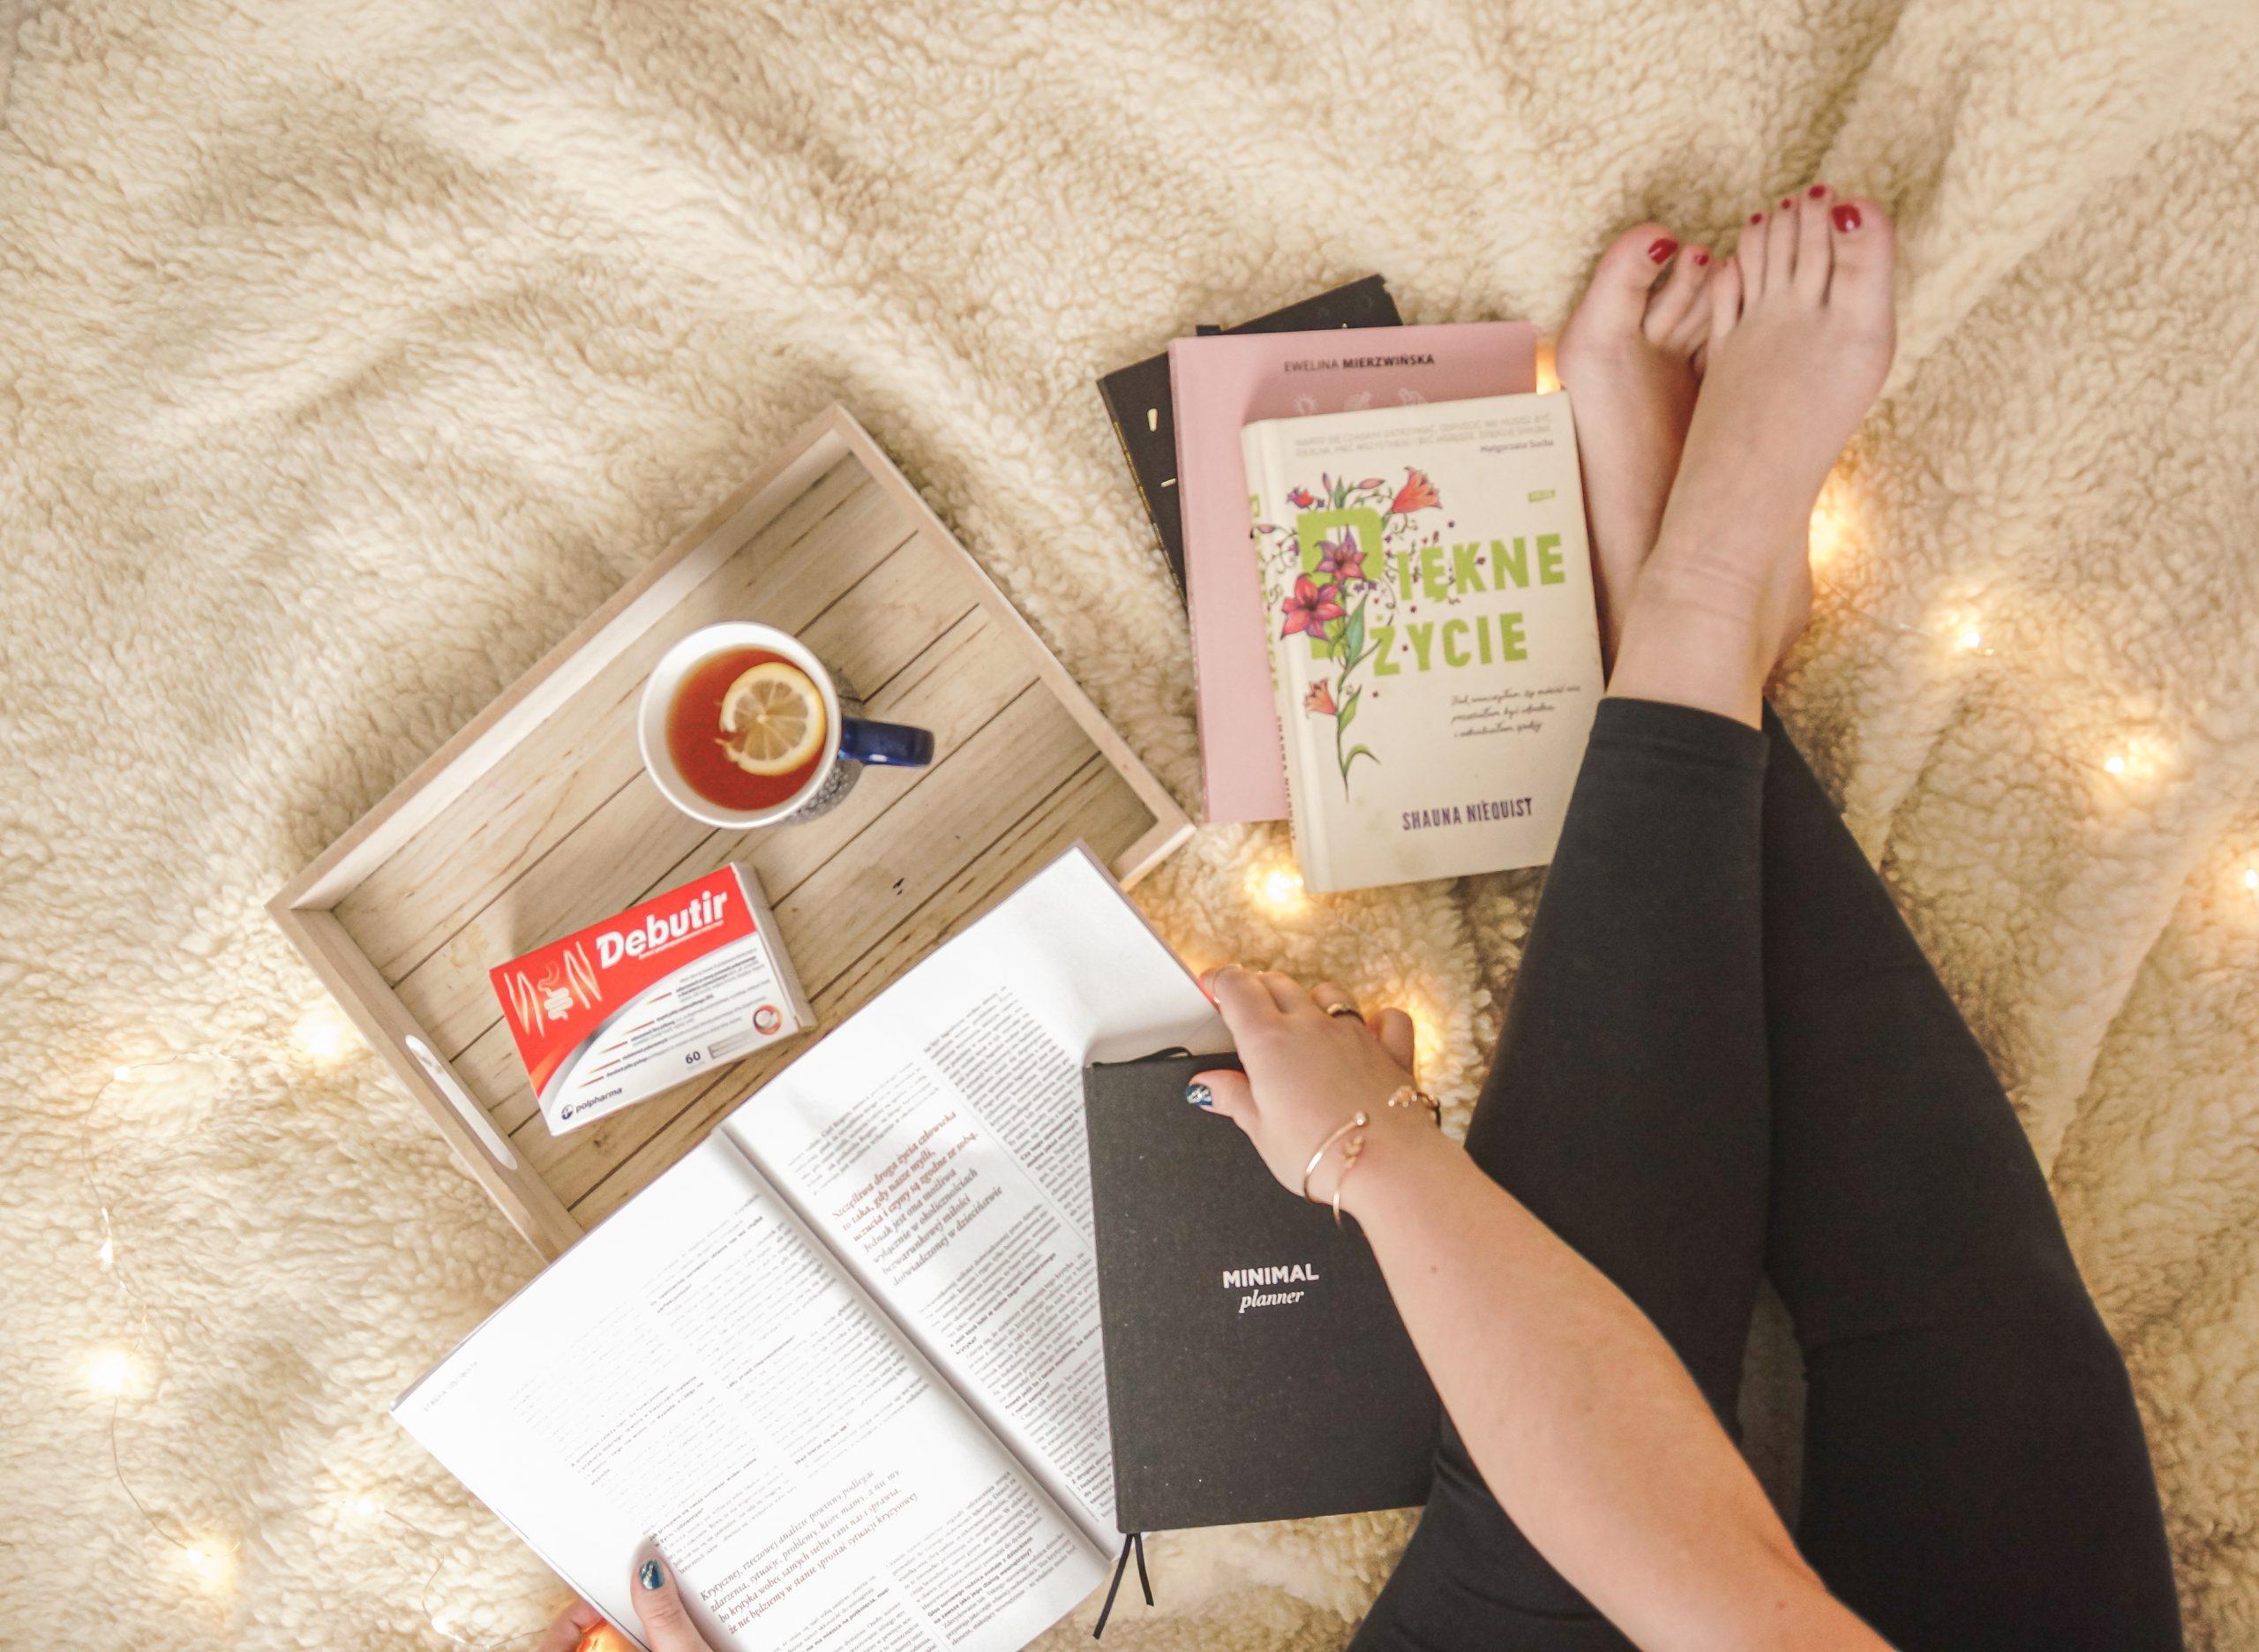 odporność, debutir, książka piękne życie, minimalplaner